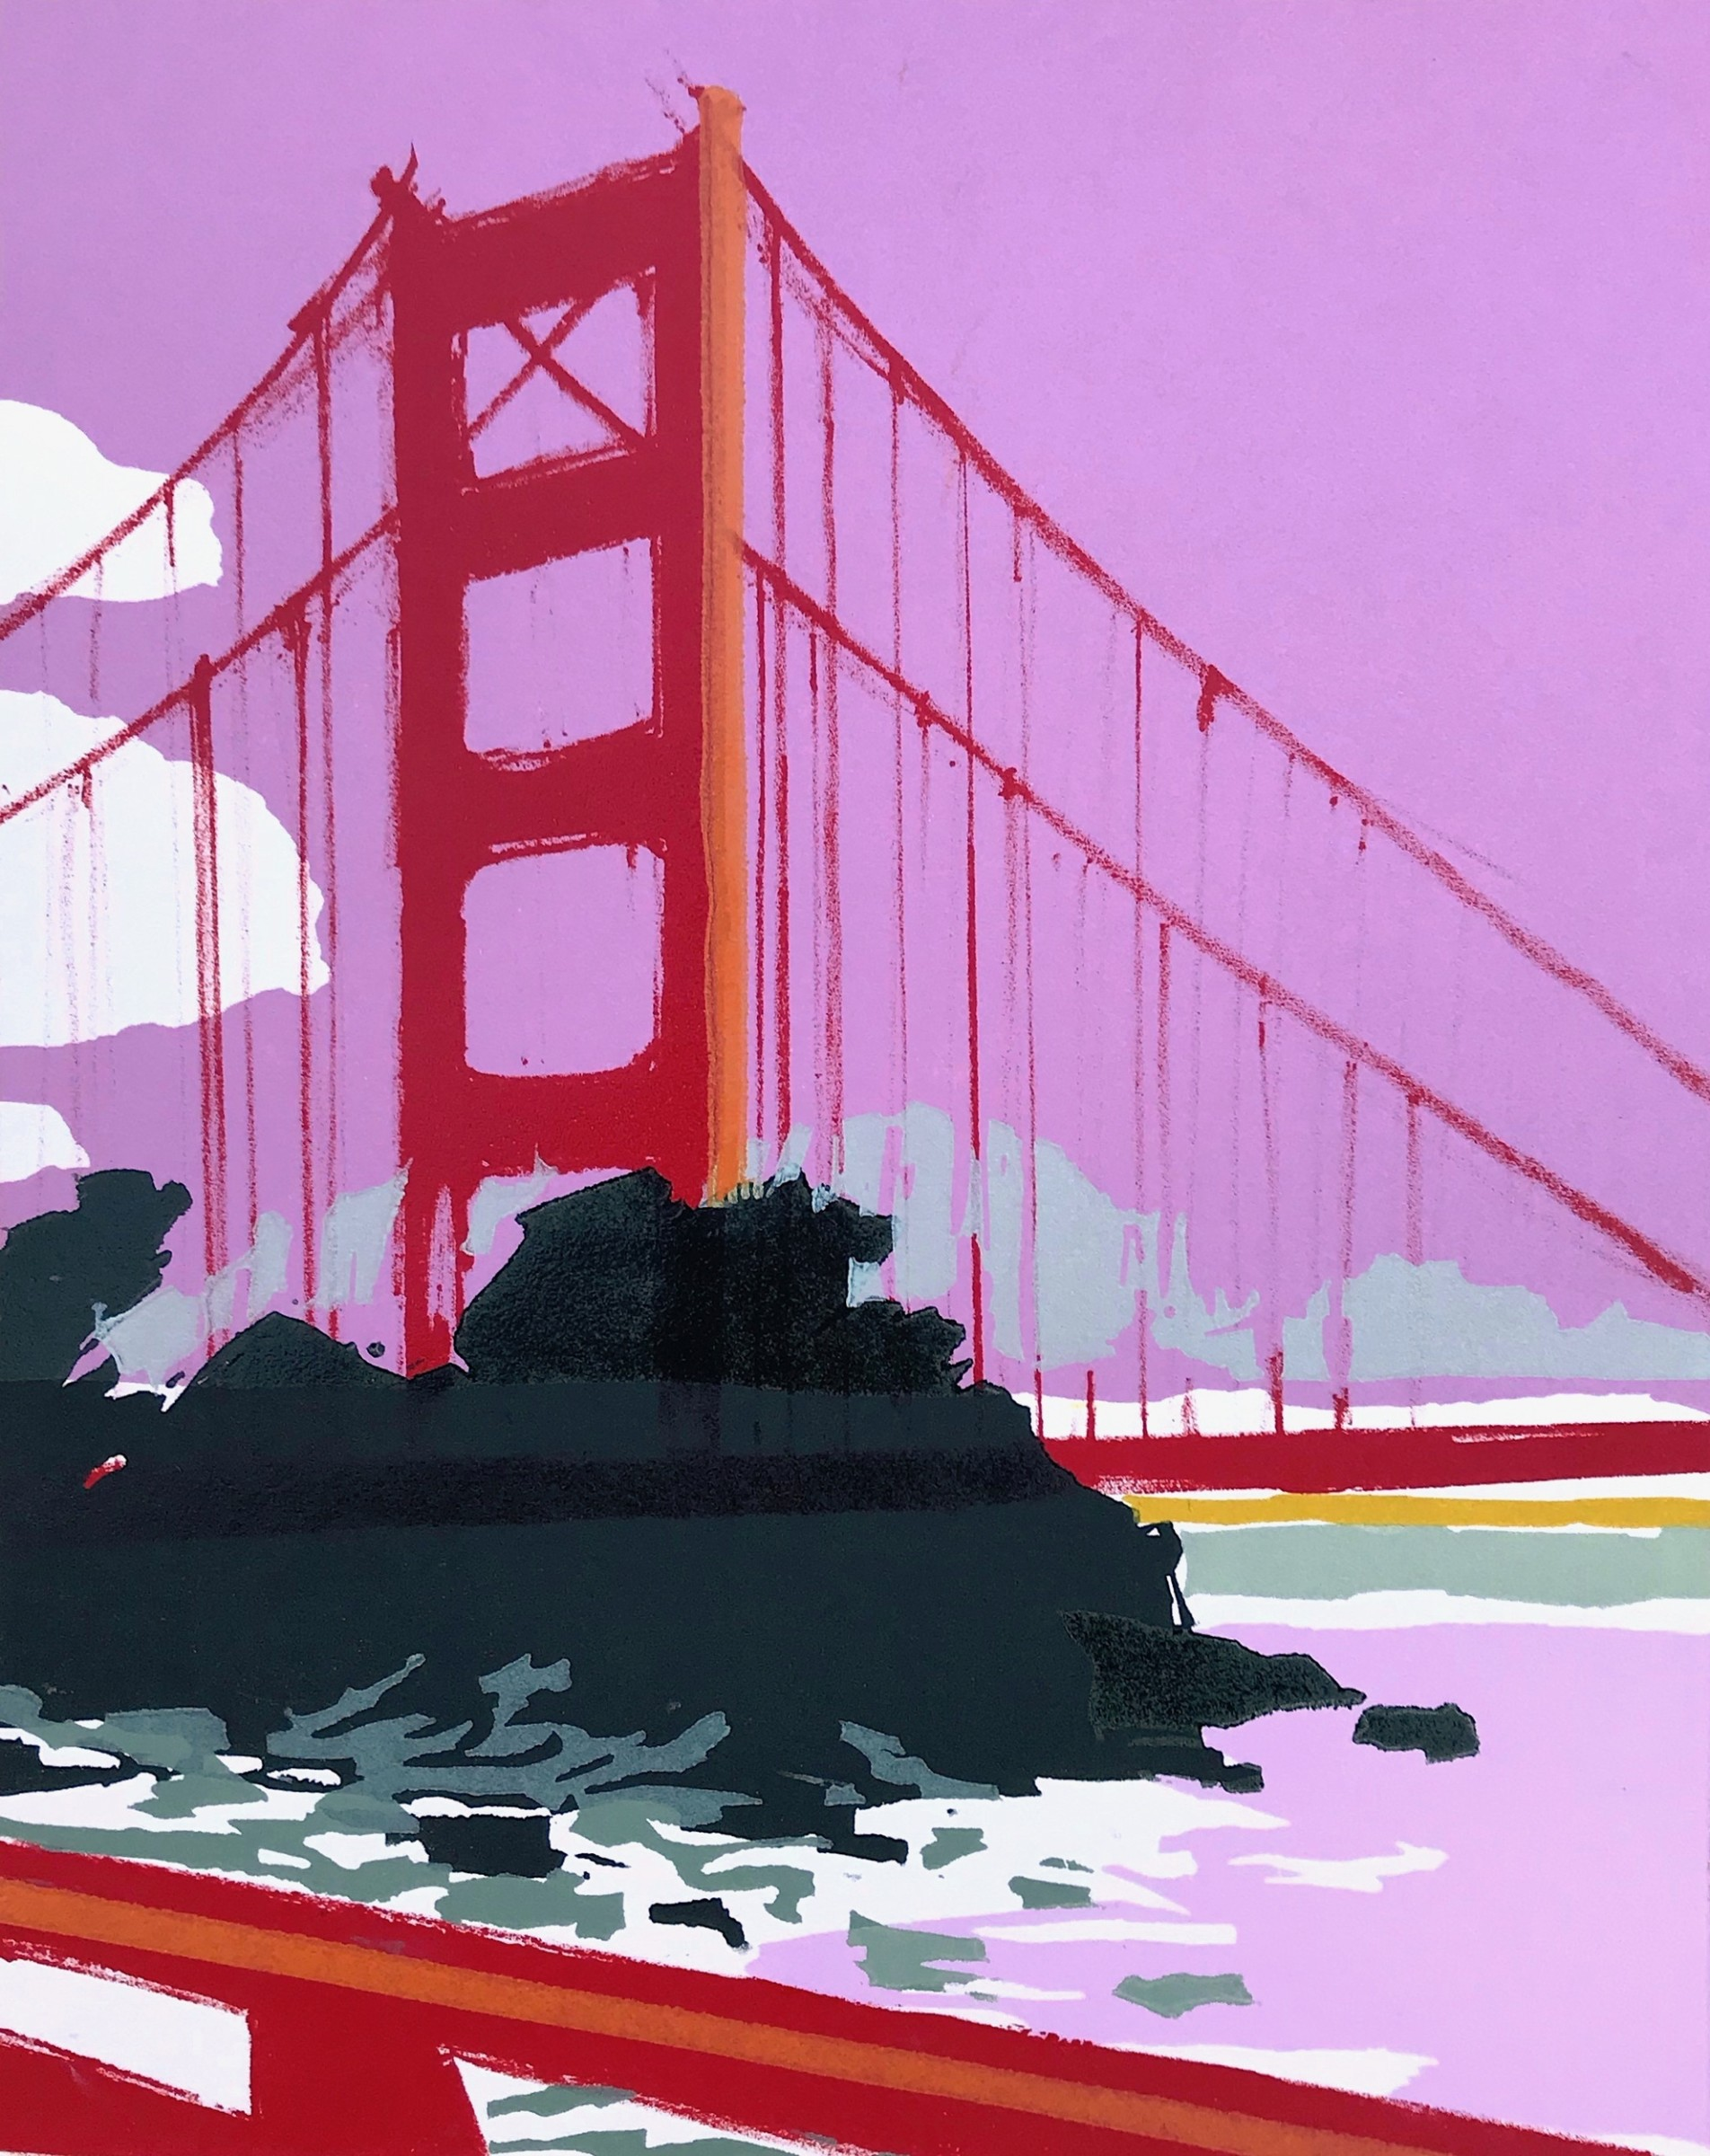 "<span class=""link fancybox-details-link""><a href=""/artists/72-rachel-gracey-re/works/10686/"">View Detail Page</a></span><div class=""artist""><span class=""artist""><strong>Rachel Gracey RE</strong></span></div><div class=""title""><em>Golden Gate, San Francisco</em></div><div class=""medium"">lithograph and relief printing</div><div class=""dimensions"">22.5 x 28 cm image size<br /> </div><div class=""edition_details"">edition of 12</div><div class=""price"">£290.00 unframed</div>"